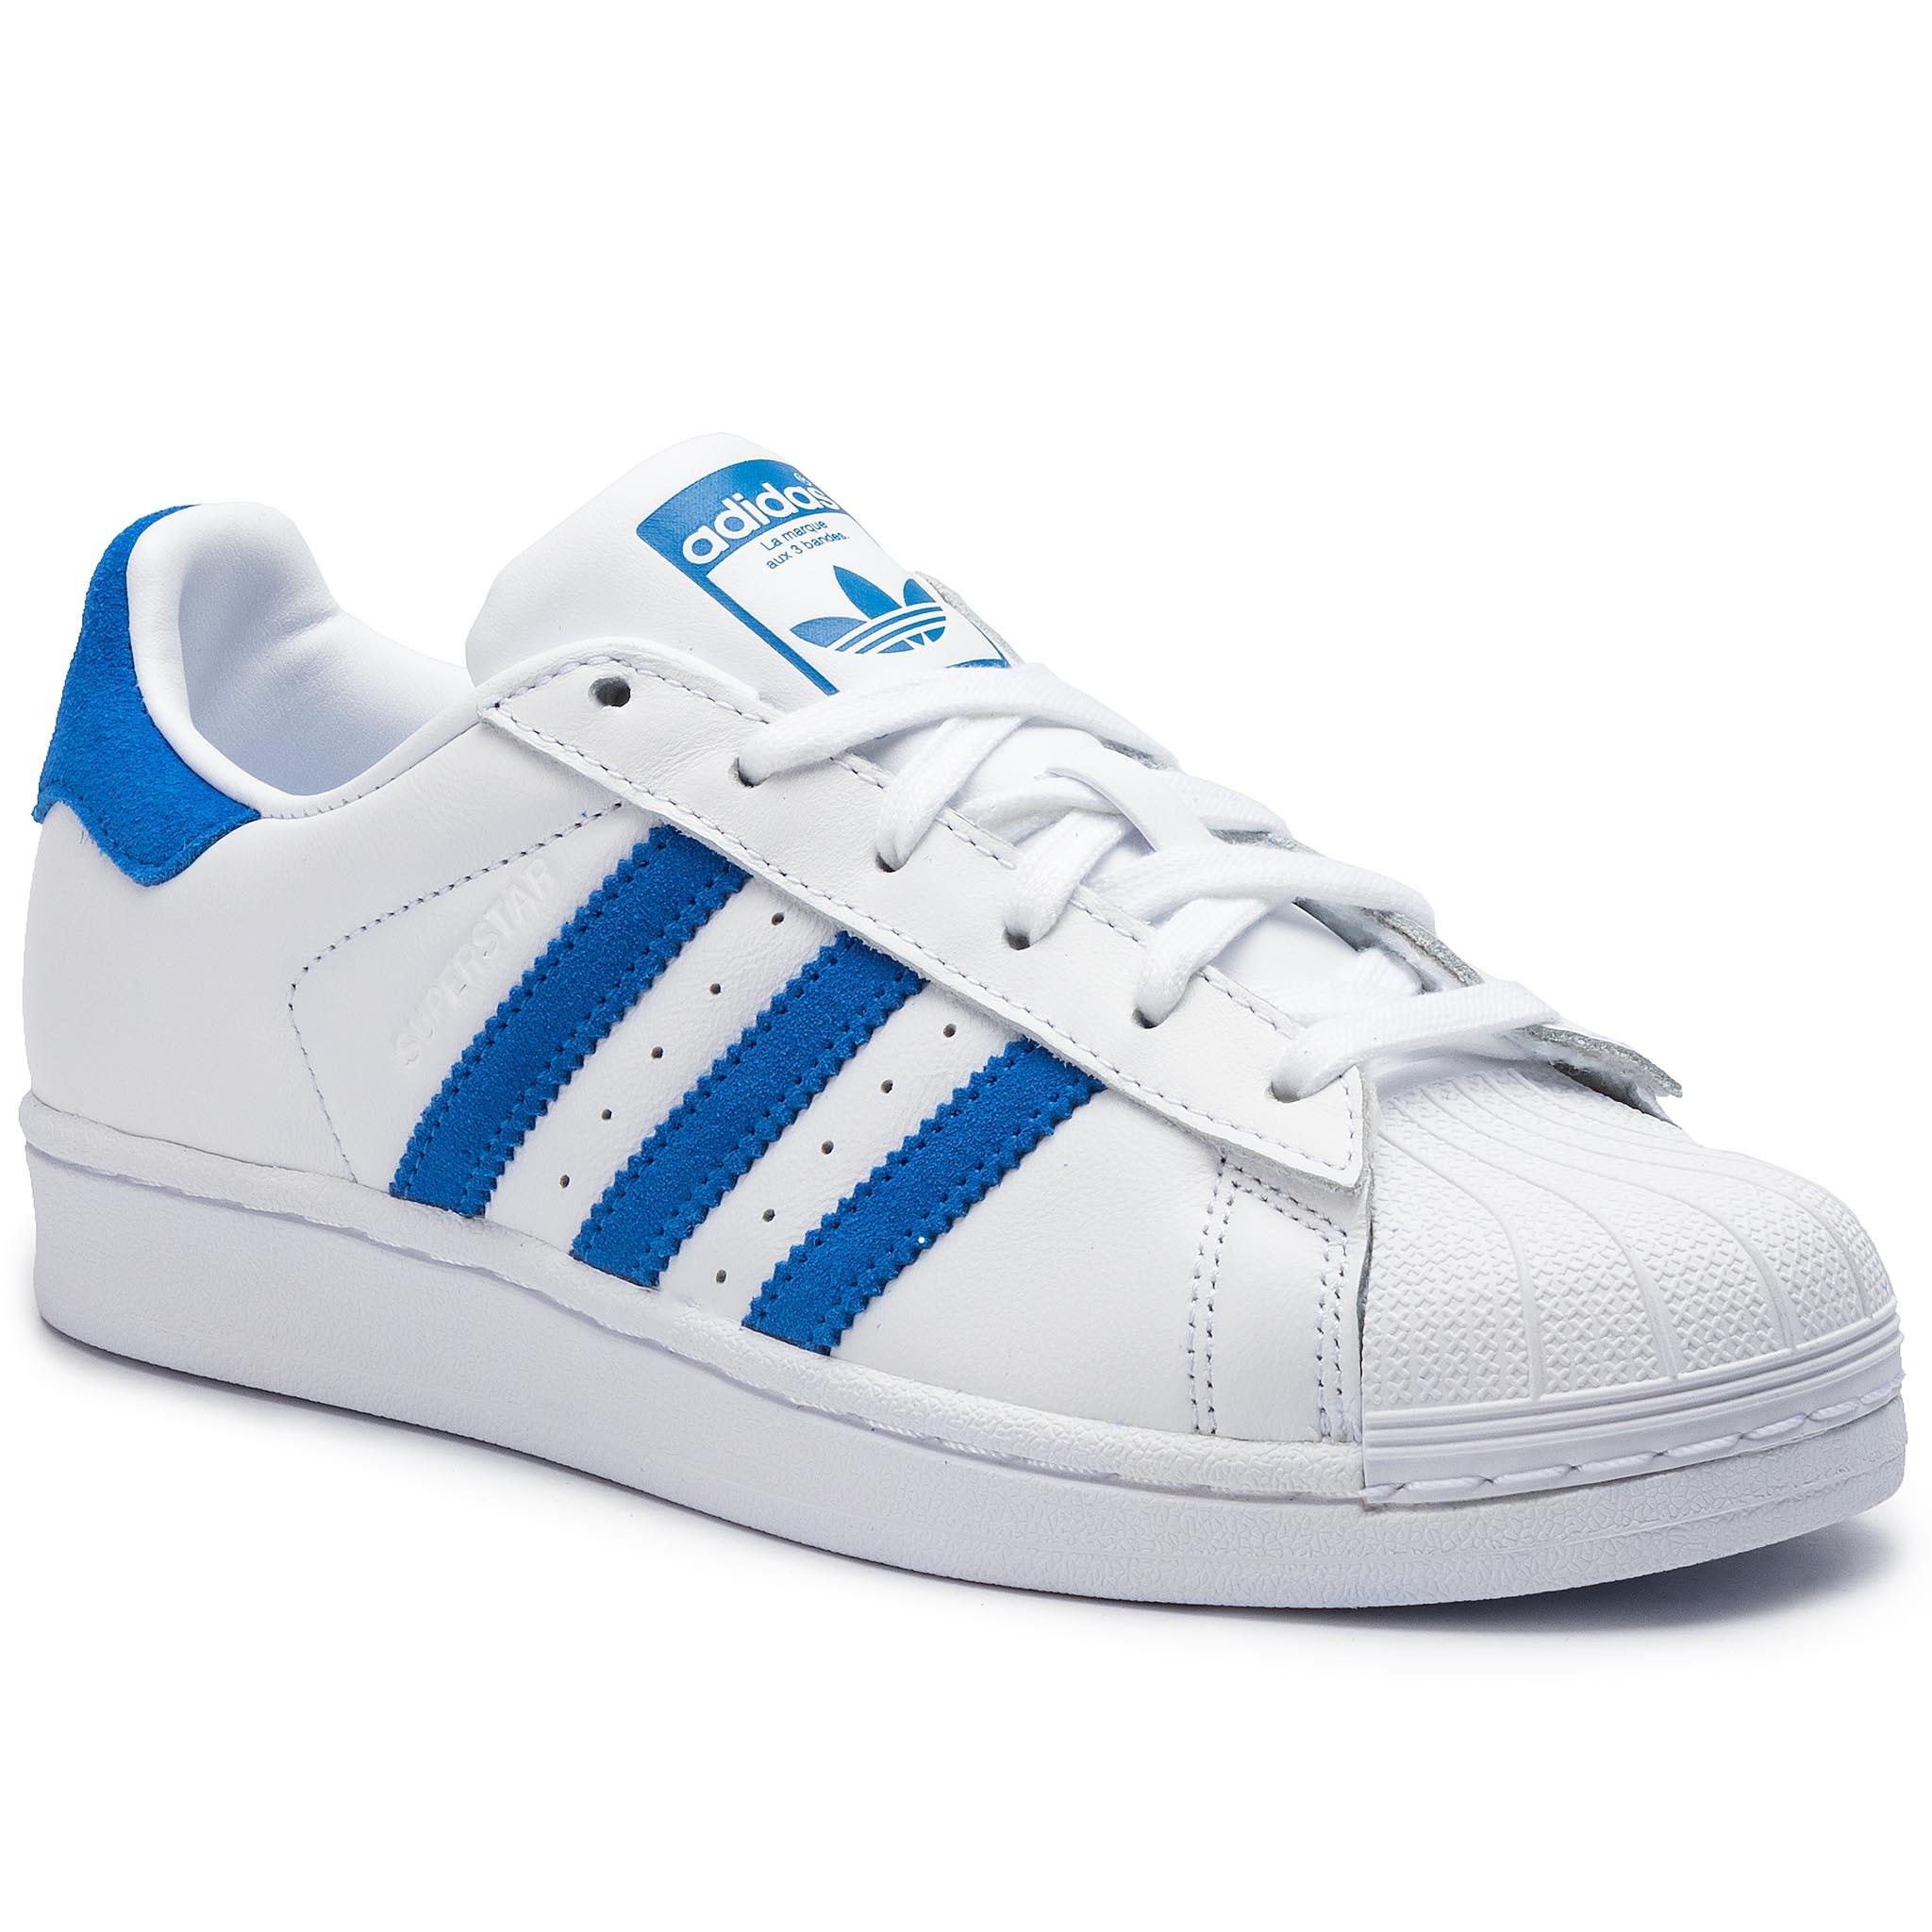 Topánky adidas - Superstar EE4474 Ftwwht/Blue/Ftwwht